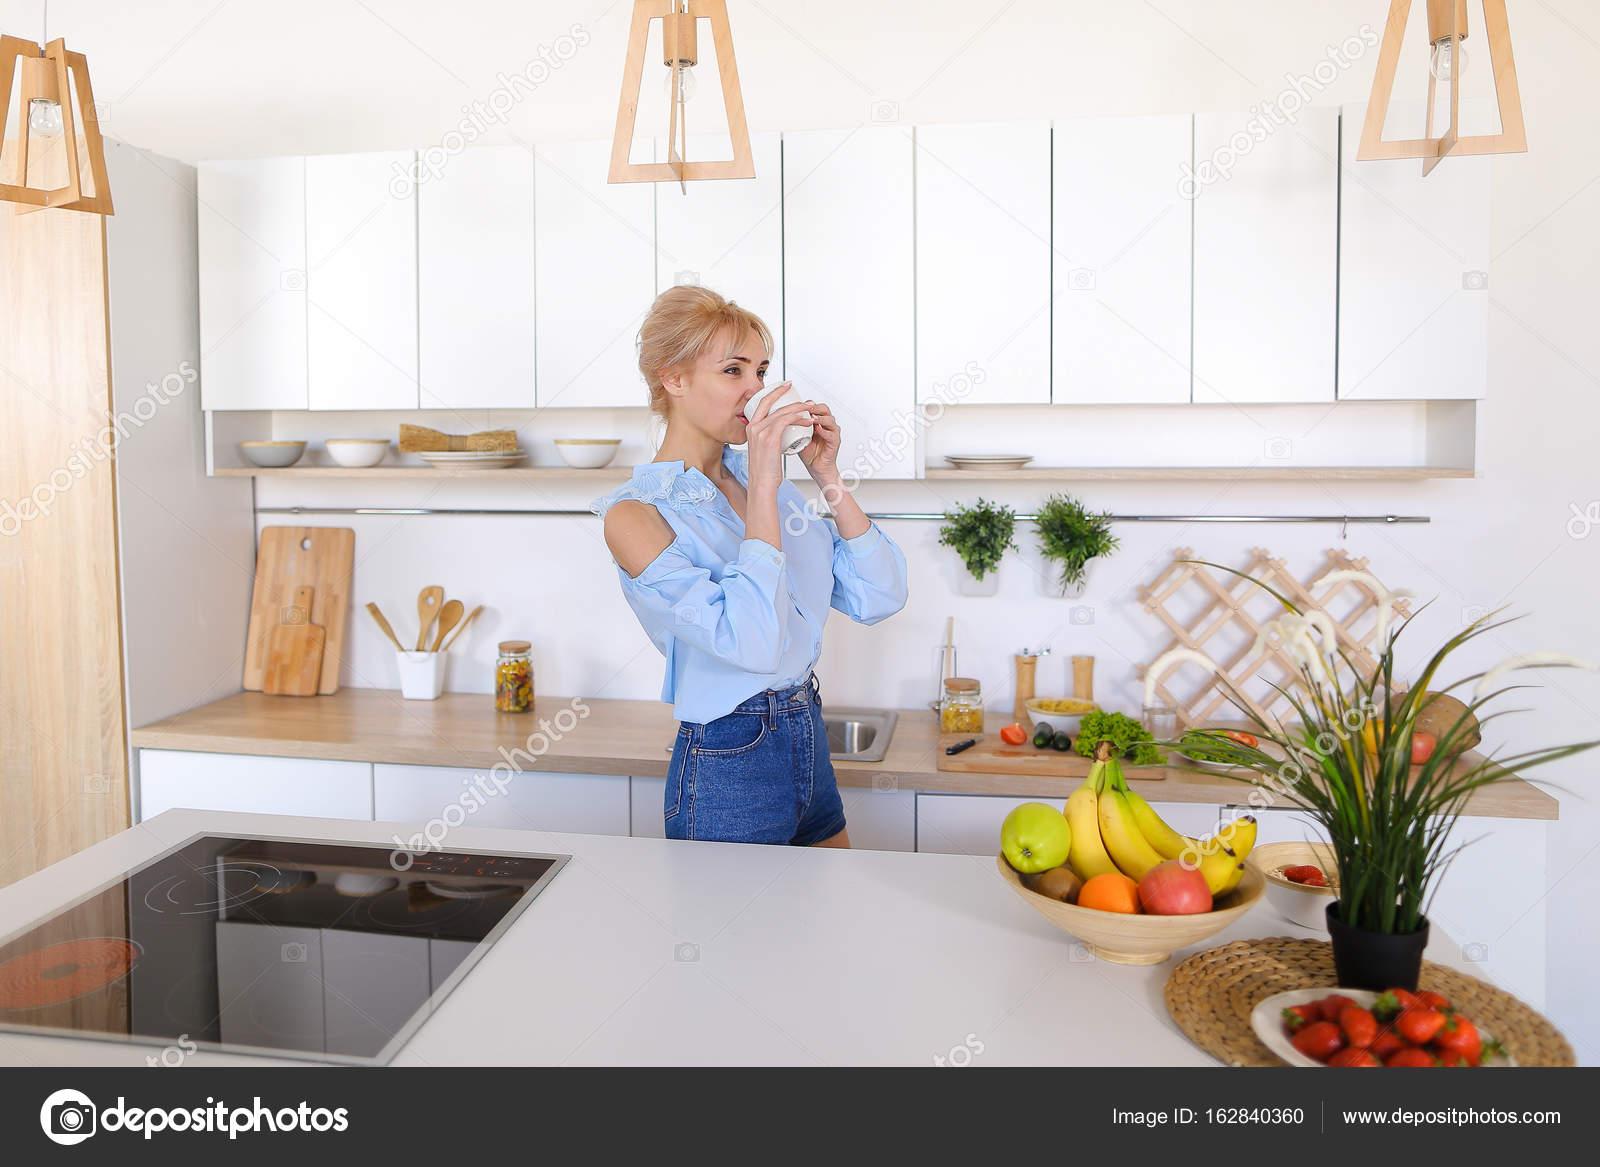 nice kitchen tables mobile trailers 漂亮的女孩走进了厨房和伸展运动 享受早晨c 图库照片 c sisterspro 有魅力的女人走过来和去厨房的桌子 举起双手向两侧上下能缓解紧张和花费手香早上新鲜咖啡 用轻松的笑容 站在中间的笑